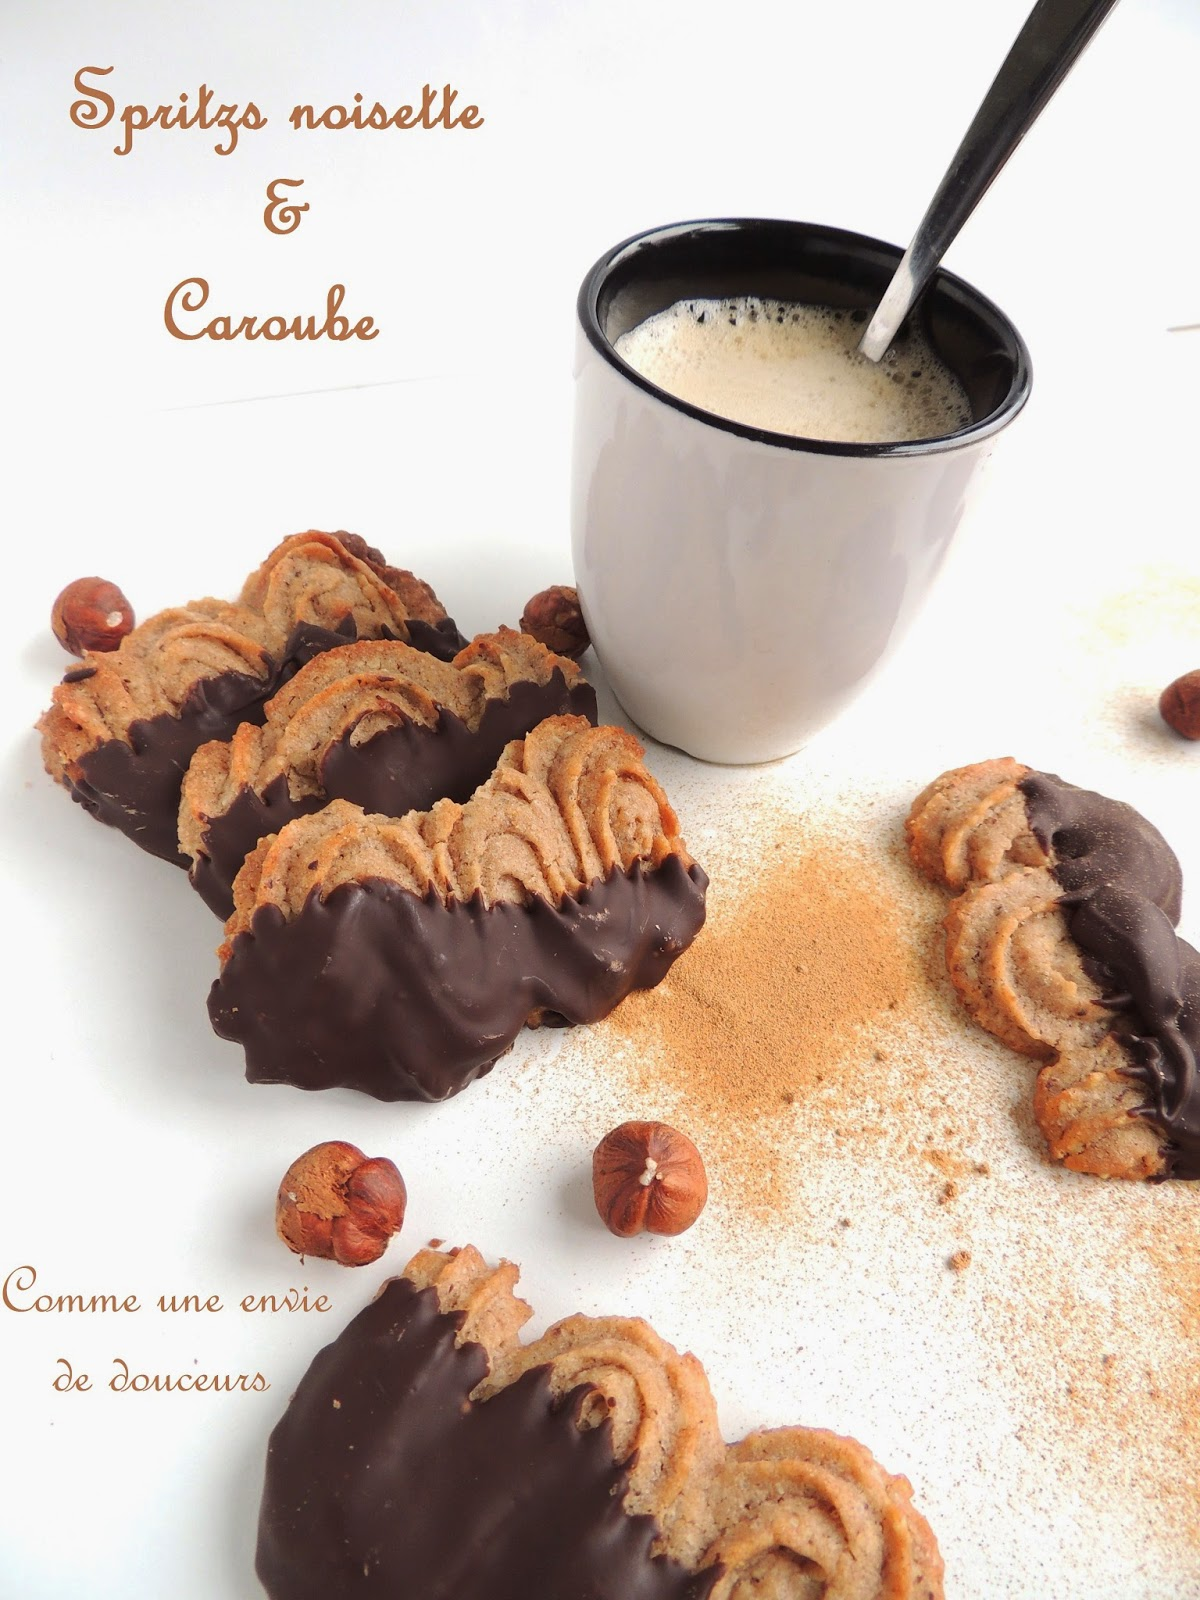 Spritzs noisette caroube – Hazelnut & carob spritzs